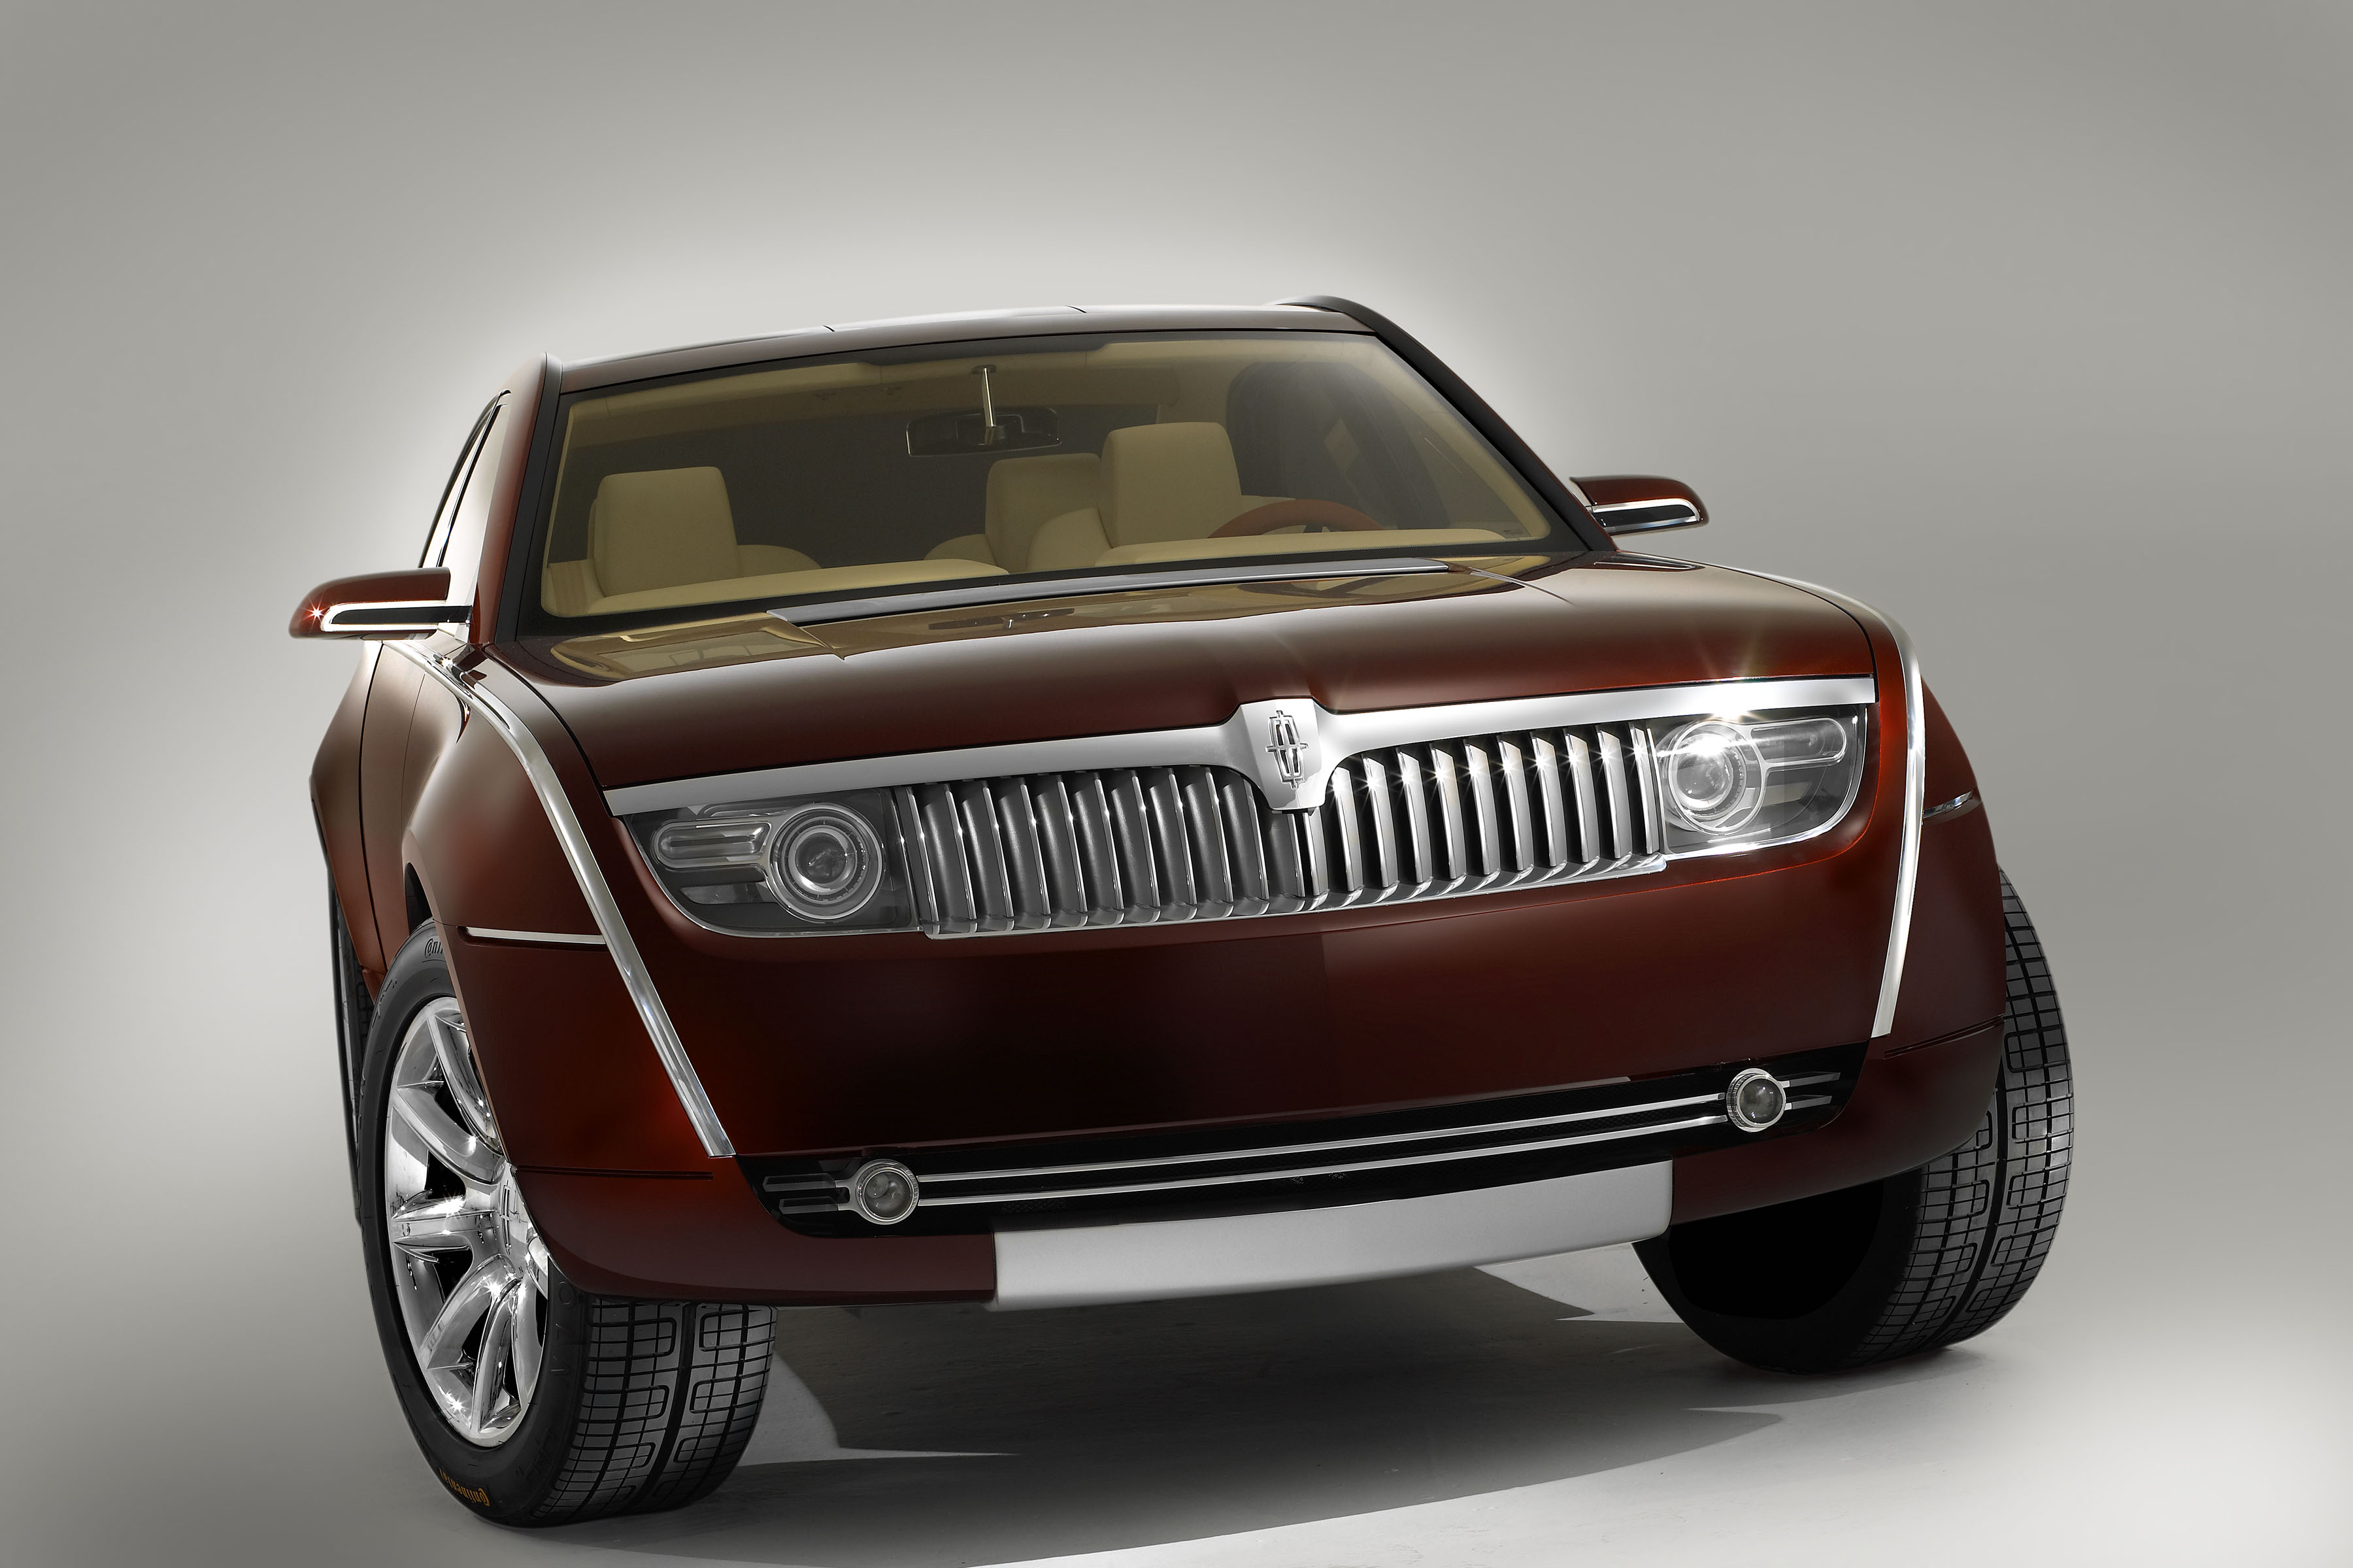 https://www.automobilesreview.com/gallery/navicross-concept/lincoln-navicross-concept-01.jpg